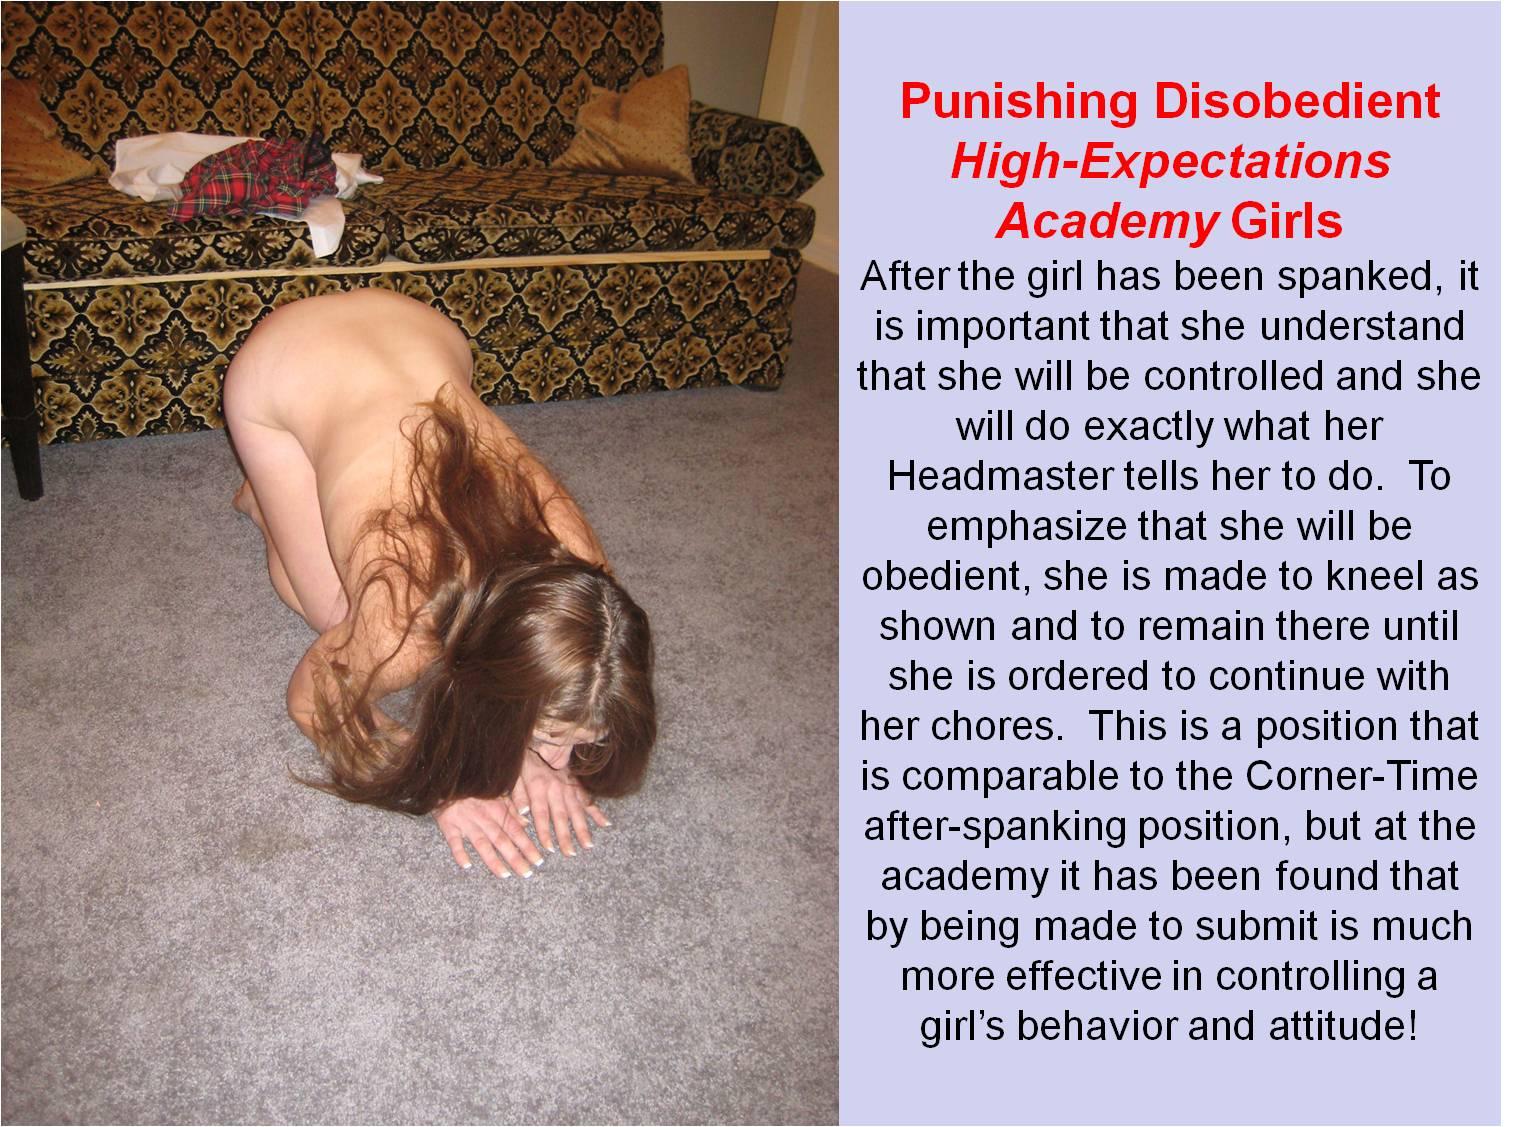 Punishing H-E Academy Girls 3